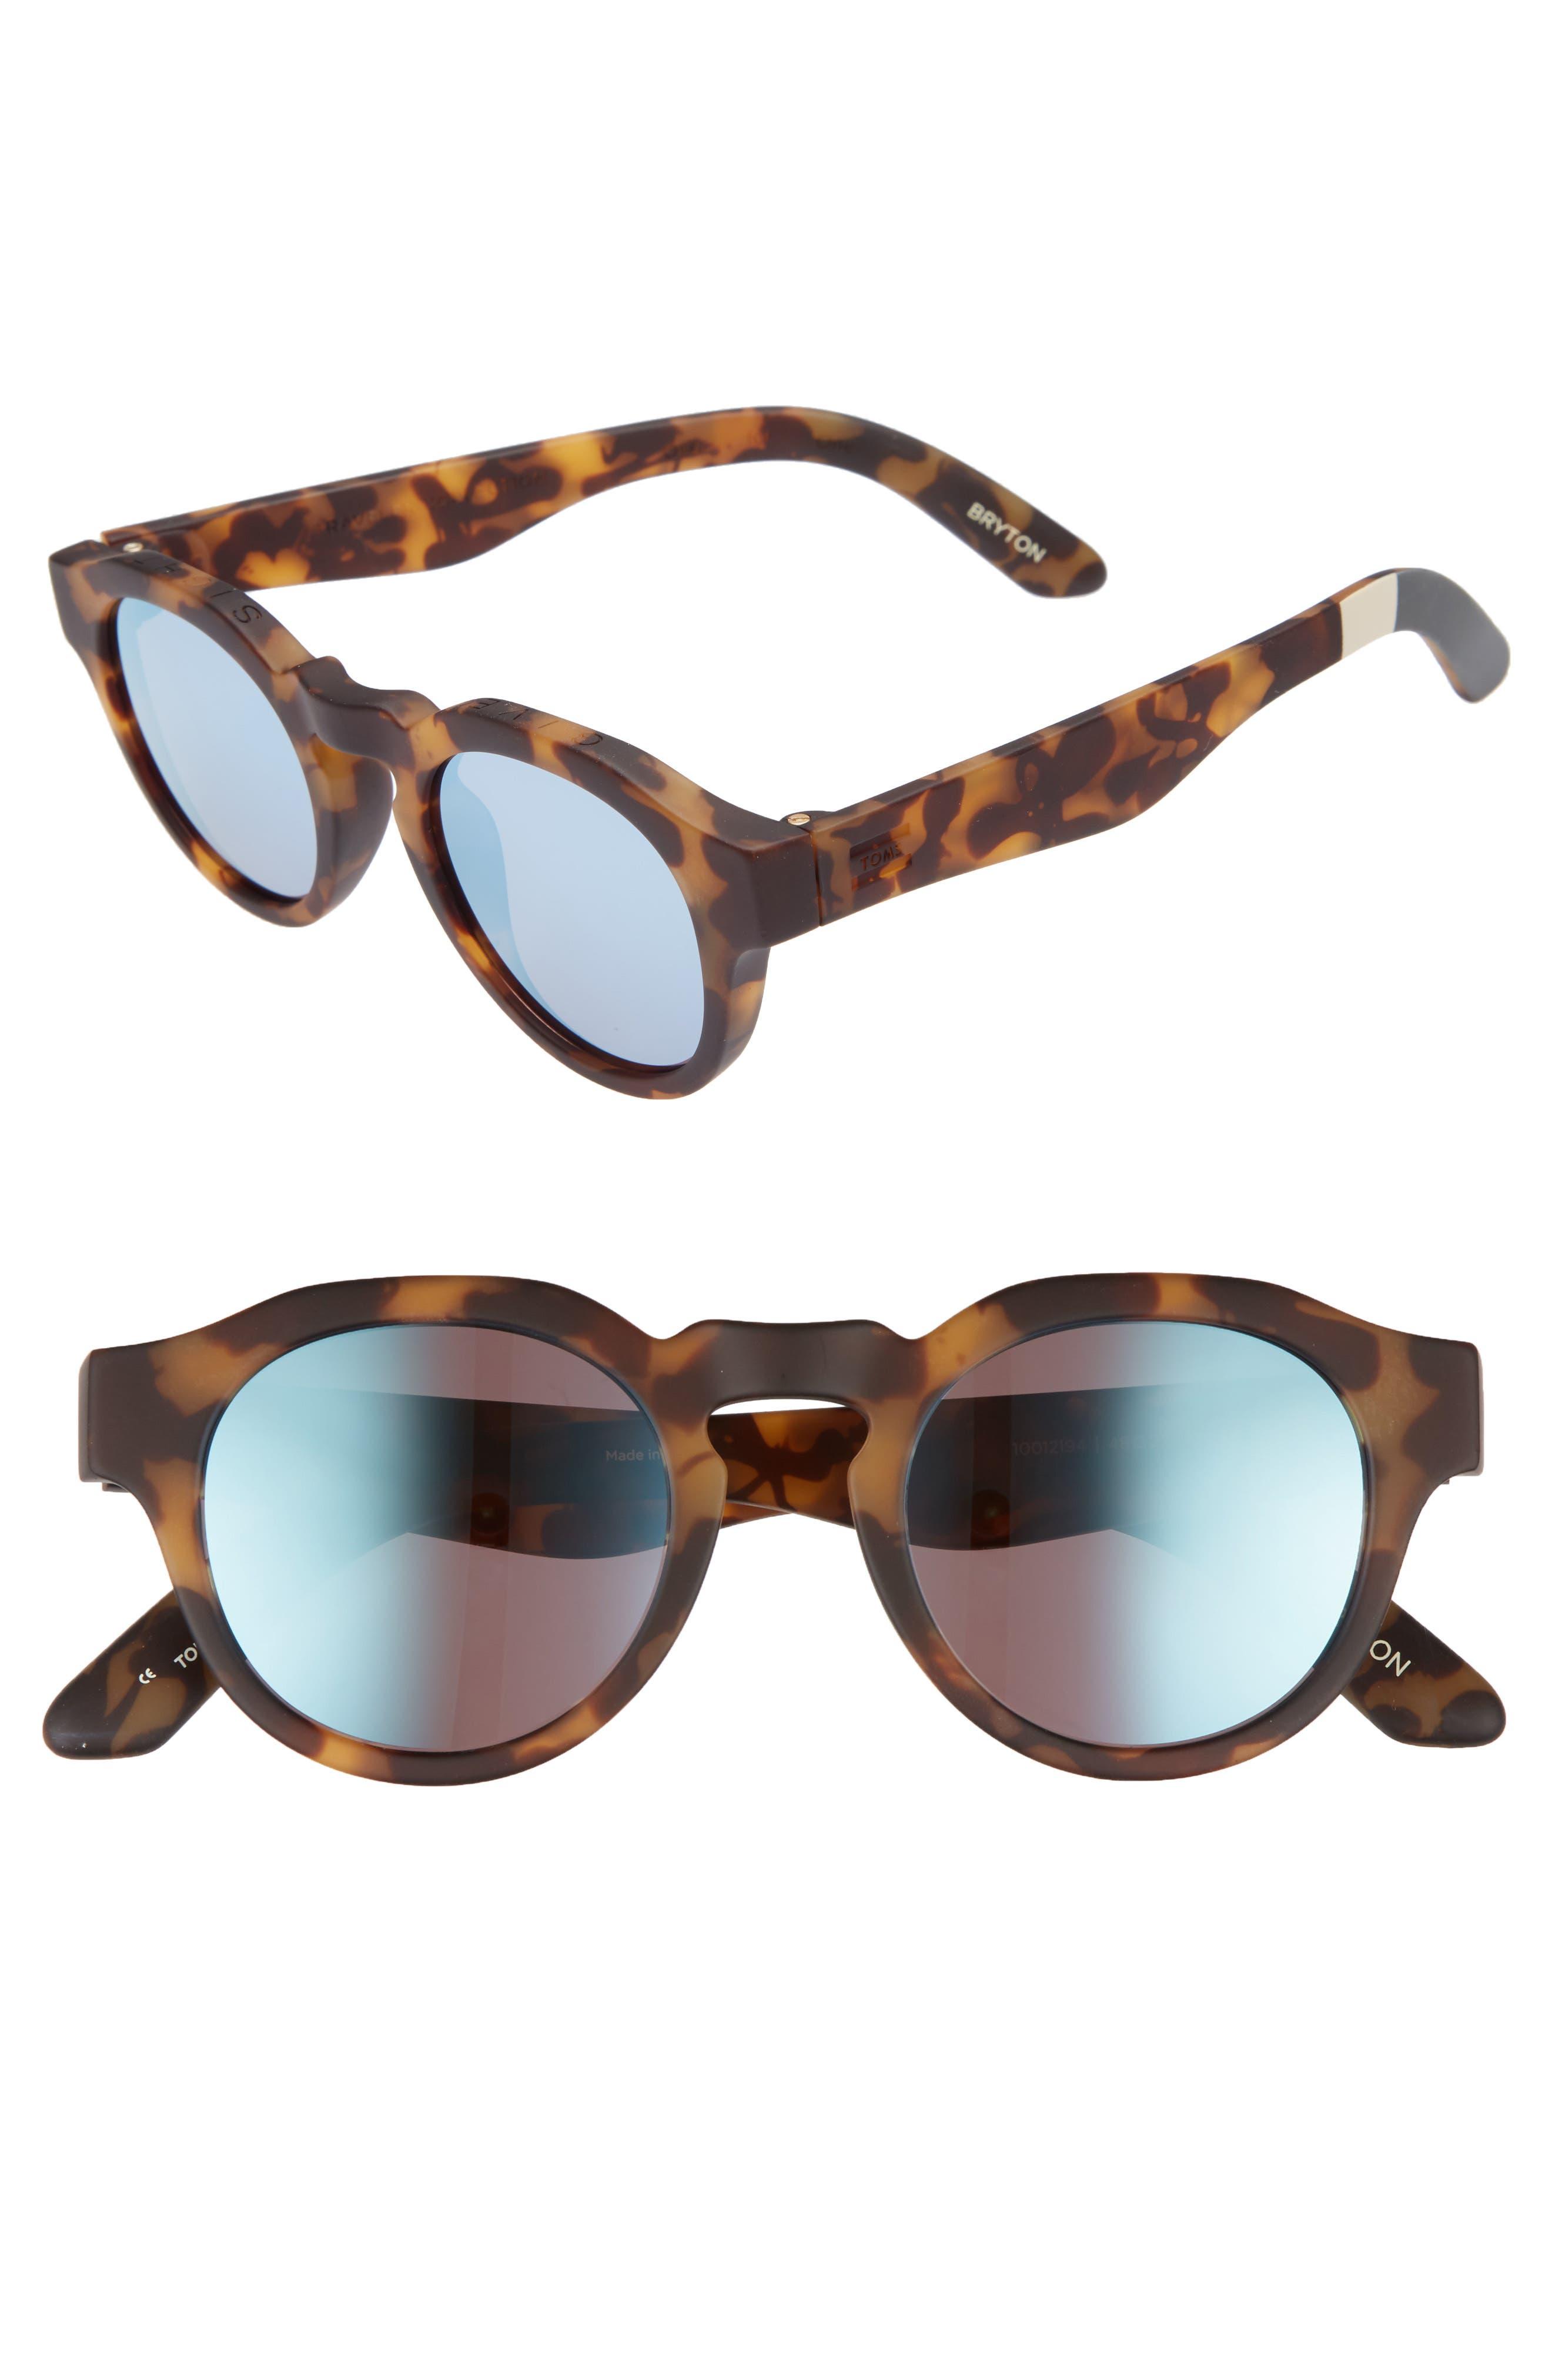 Bryton 48mm Sunglasses,                         Main,                         color, BLONDE TORTOISE